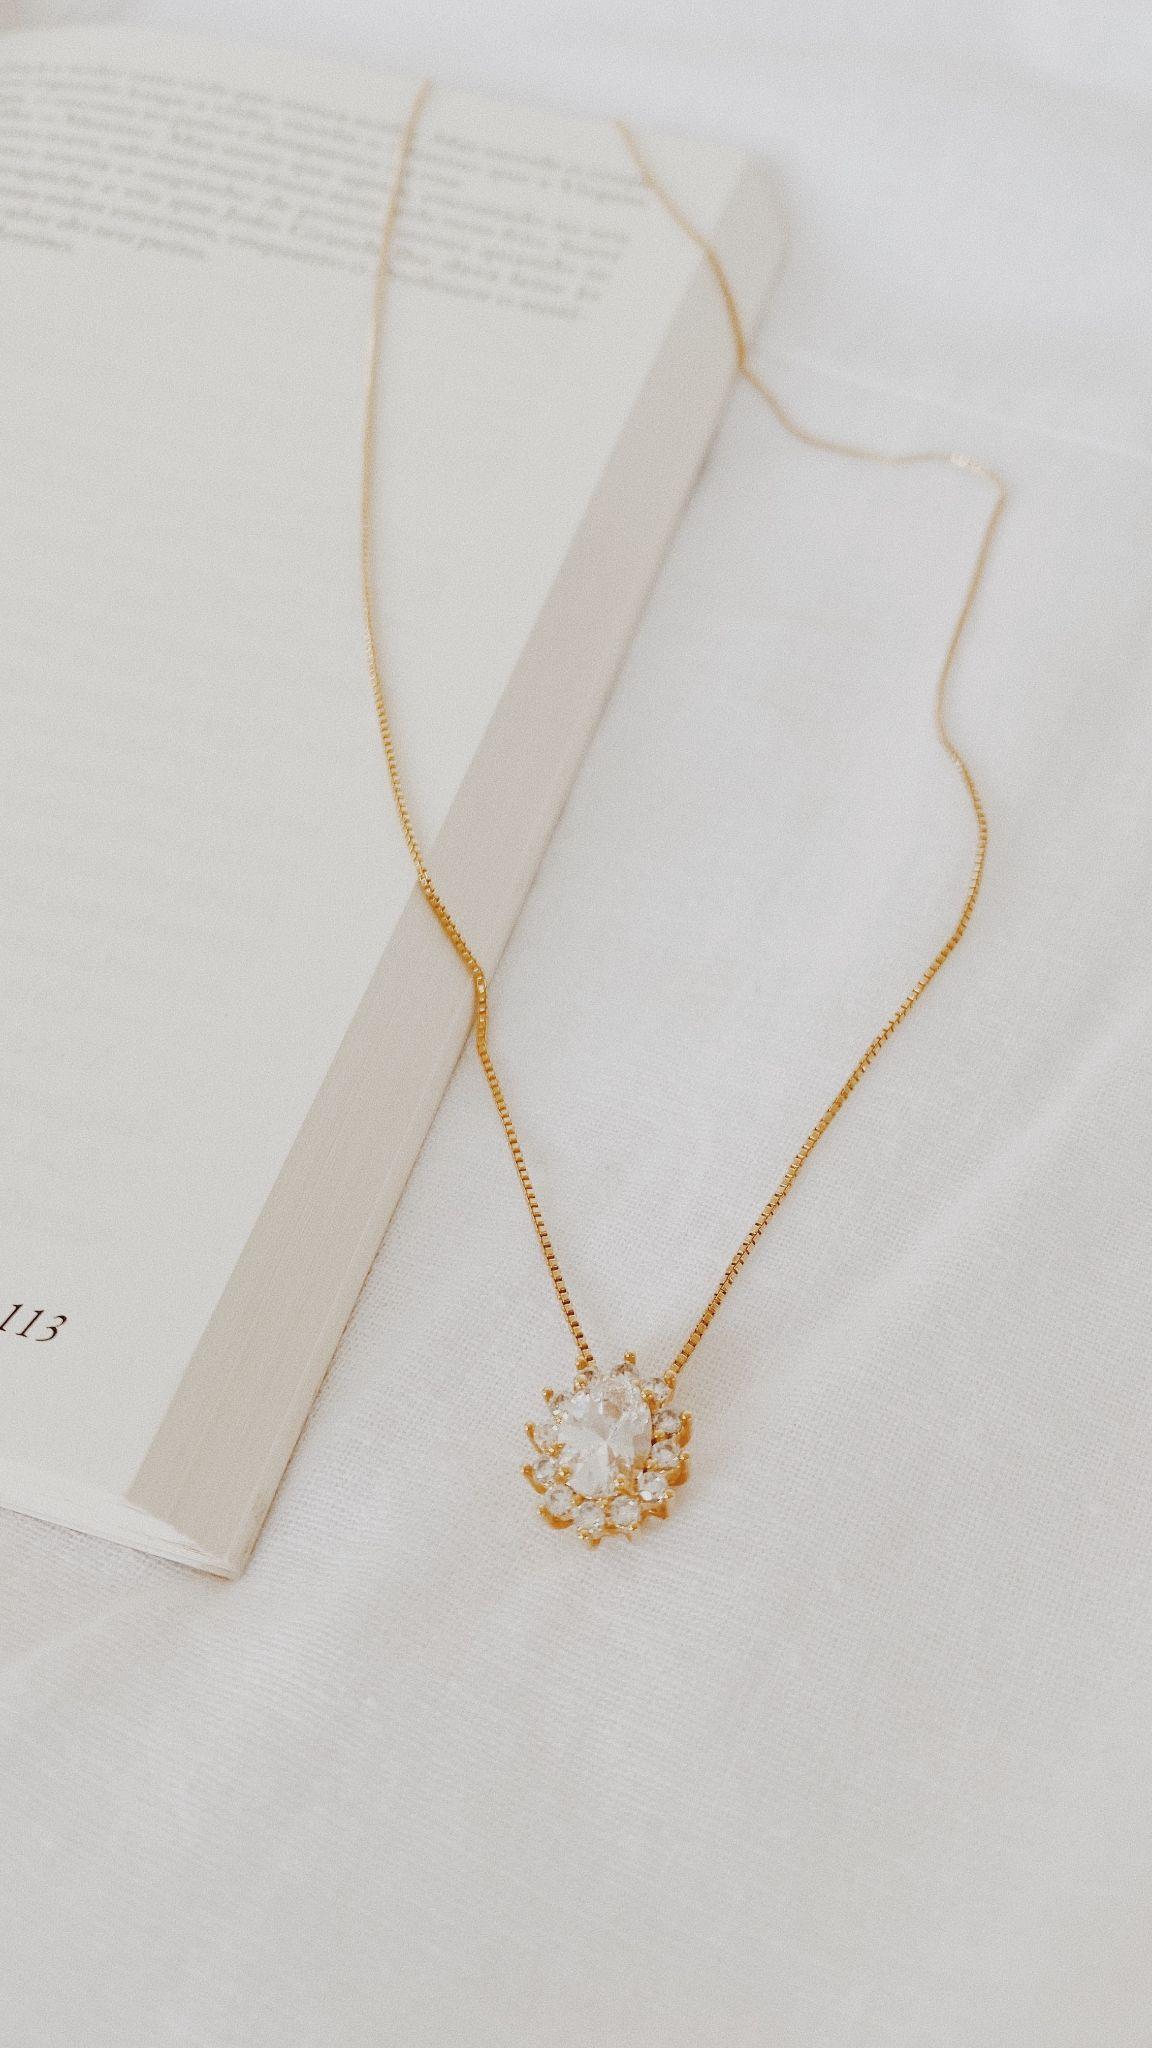 Gold Swarovski crystal necklace